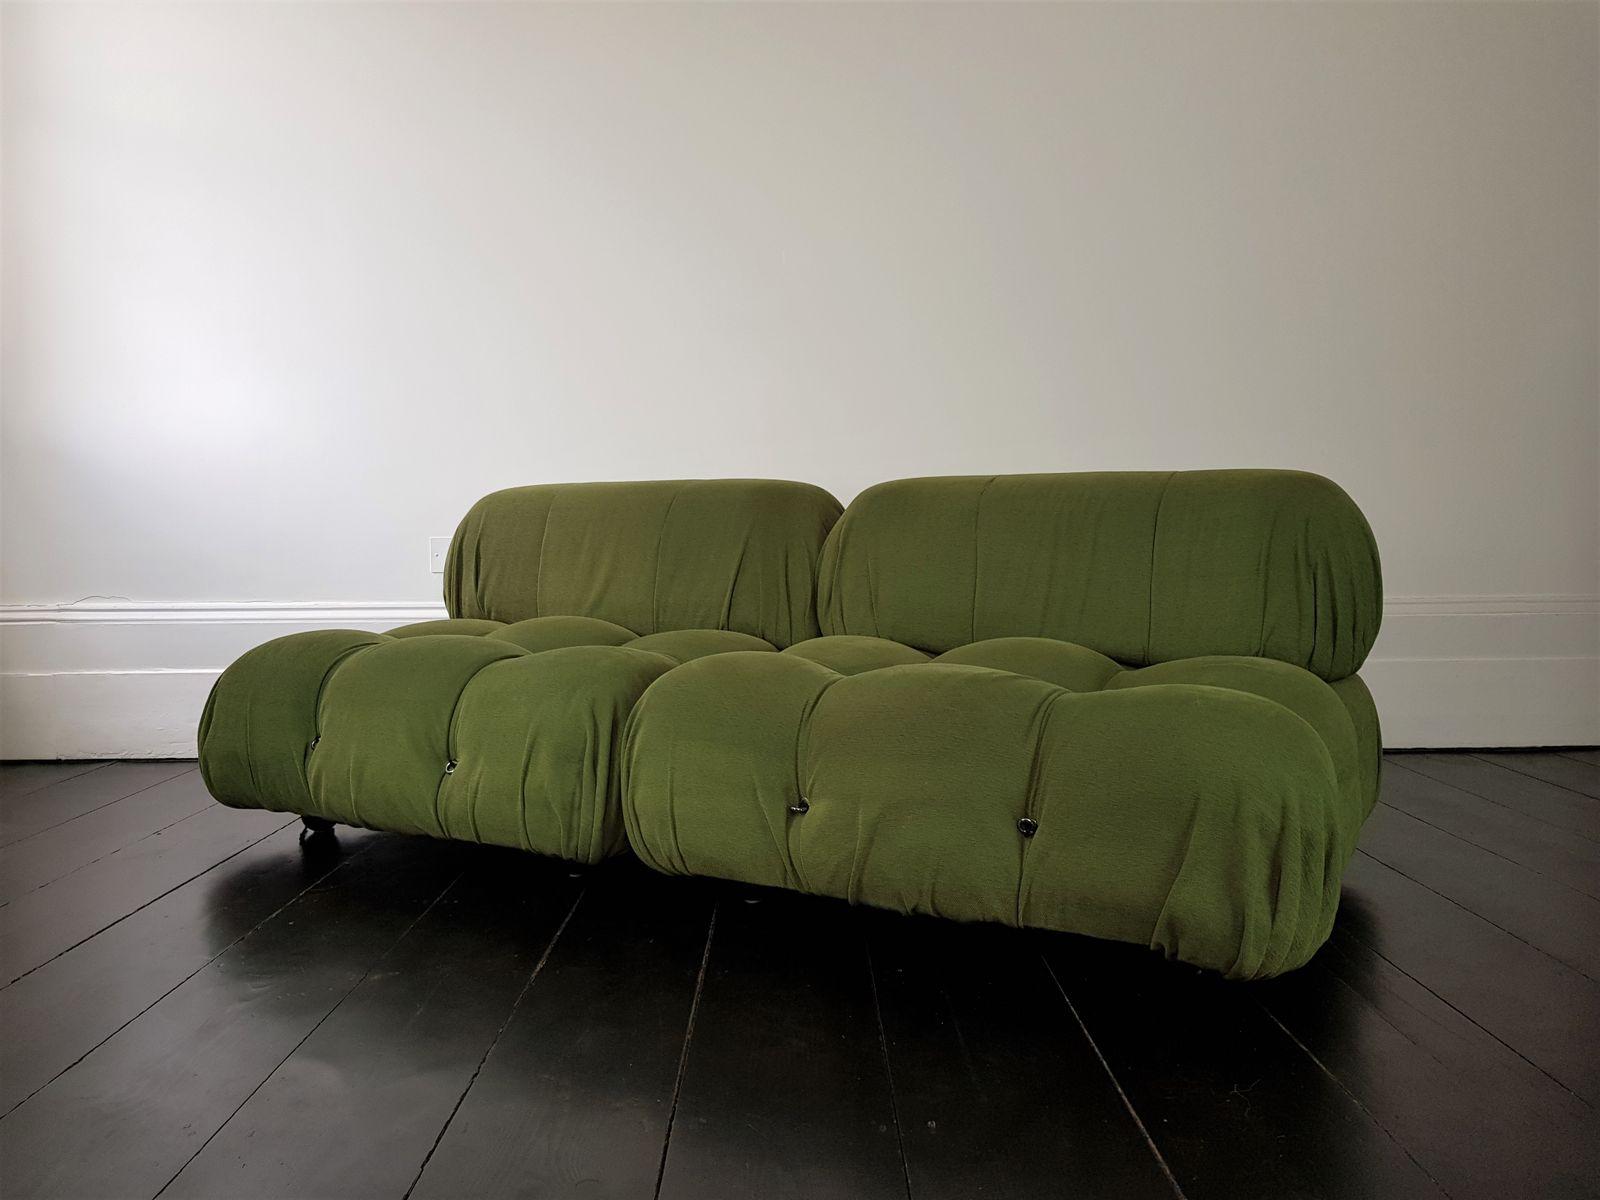 Vintage camaleonda modular sofa by mario bellini for b b for Sofa cama vintage